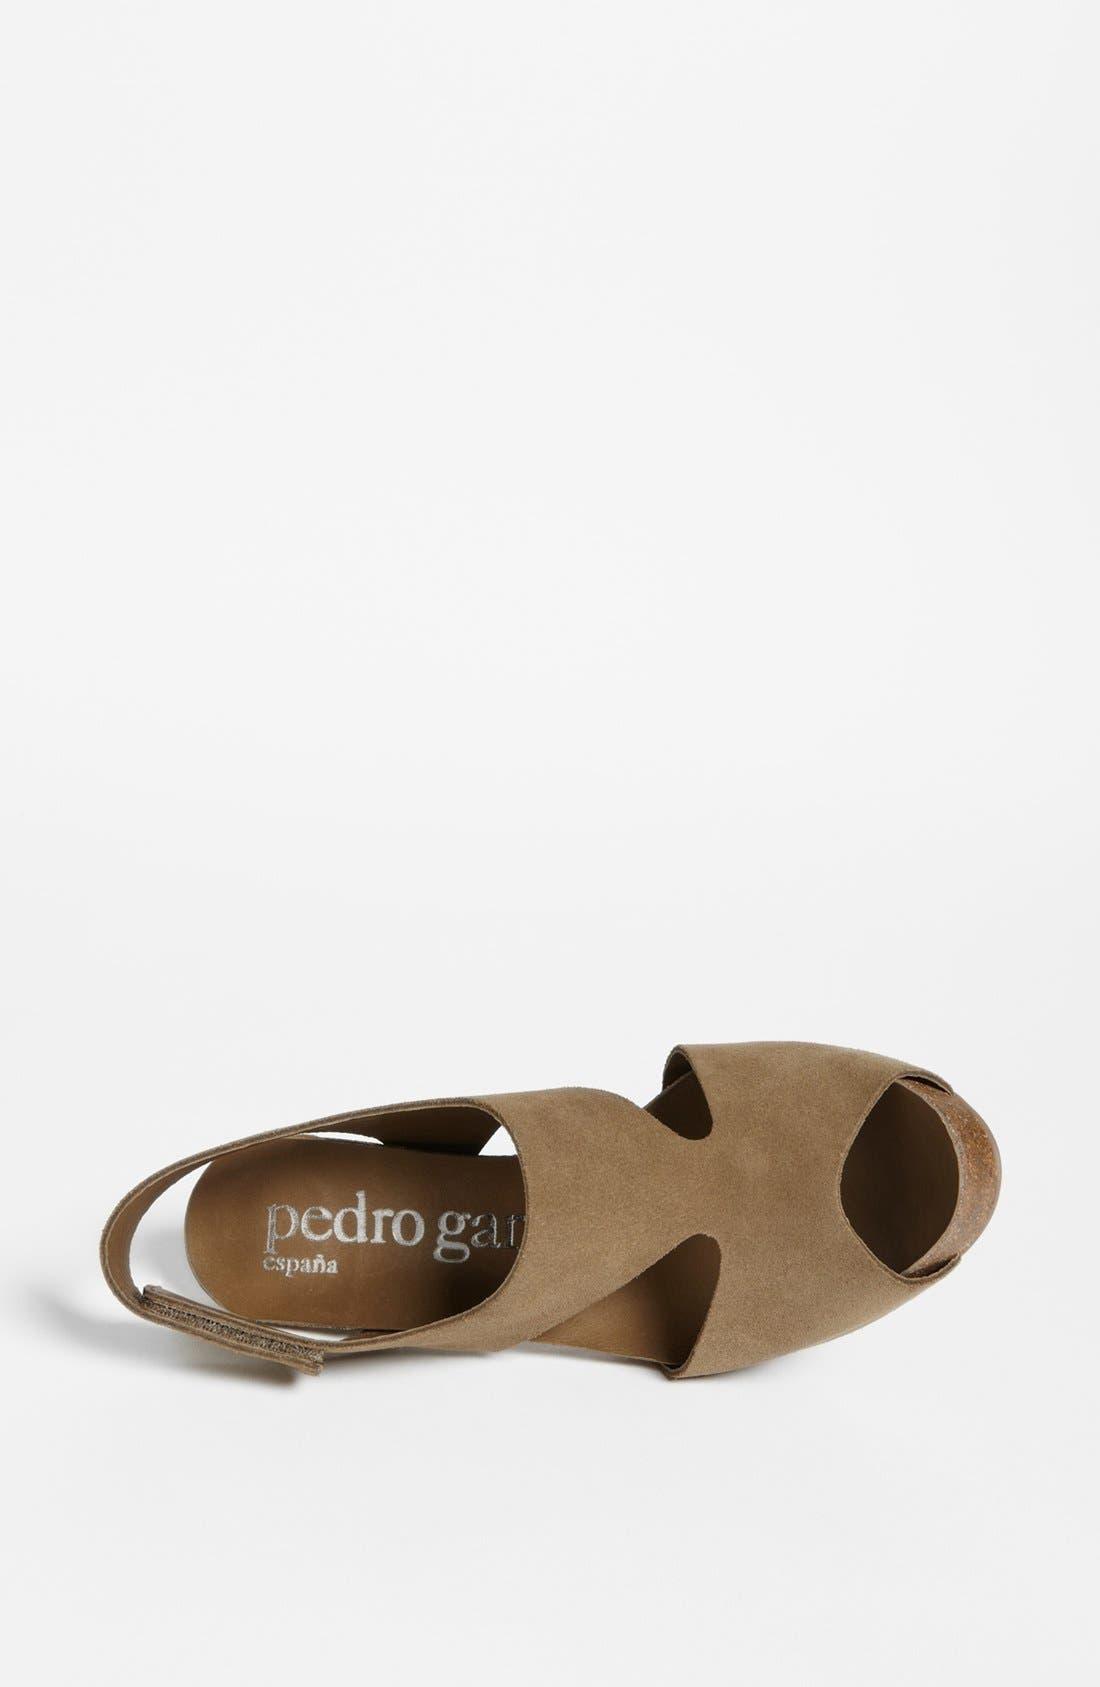 Alternate Image 3  - Pedro Garcia 'Luna' Sandal